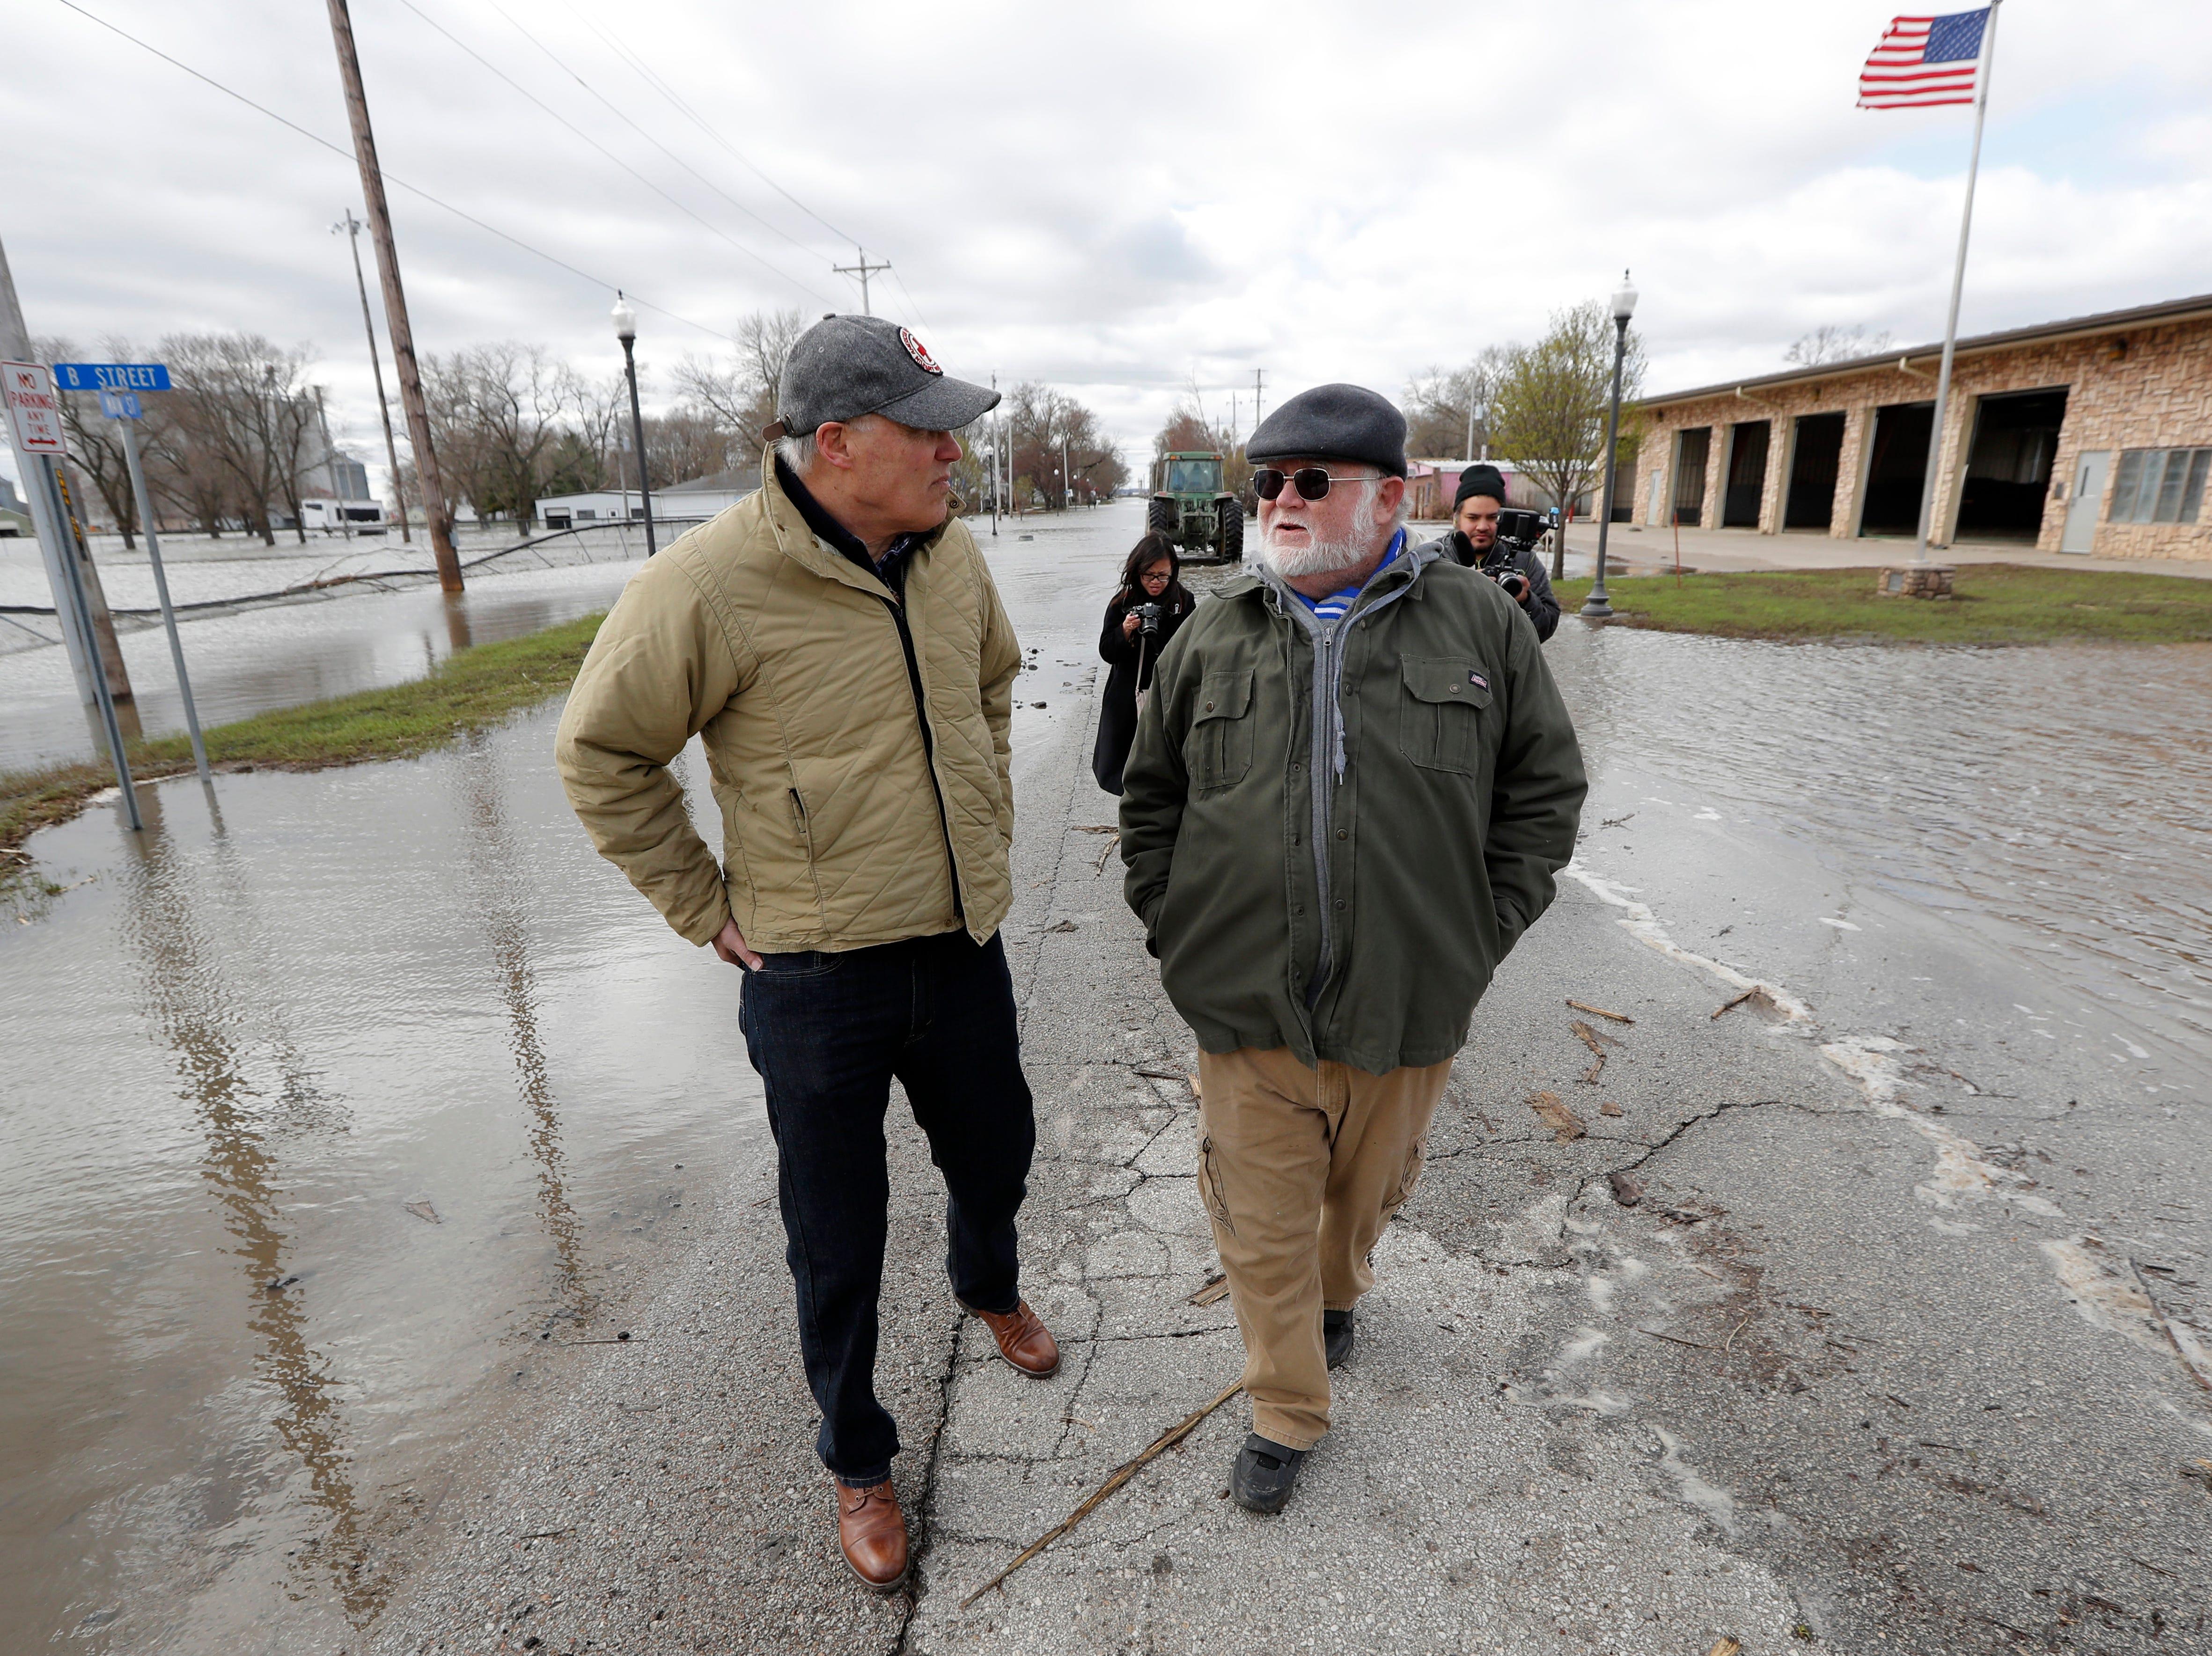 2020 Democratic presidential candidate Washington Gov. Jay Inslee, left, talks with climate analyst John Davis, of Hamburg, Iowa, while touring flood damage, Friday, April 12, 2019, in Hamburg, Iowa.